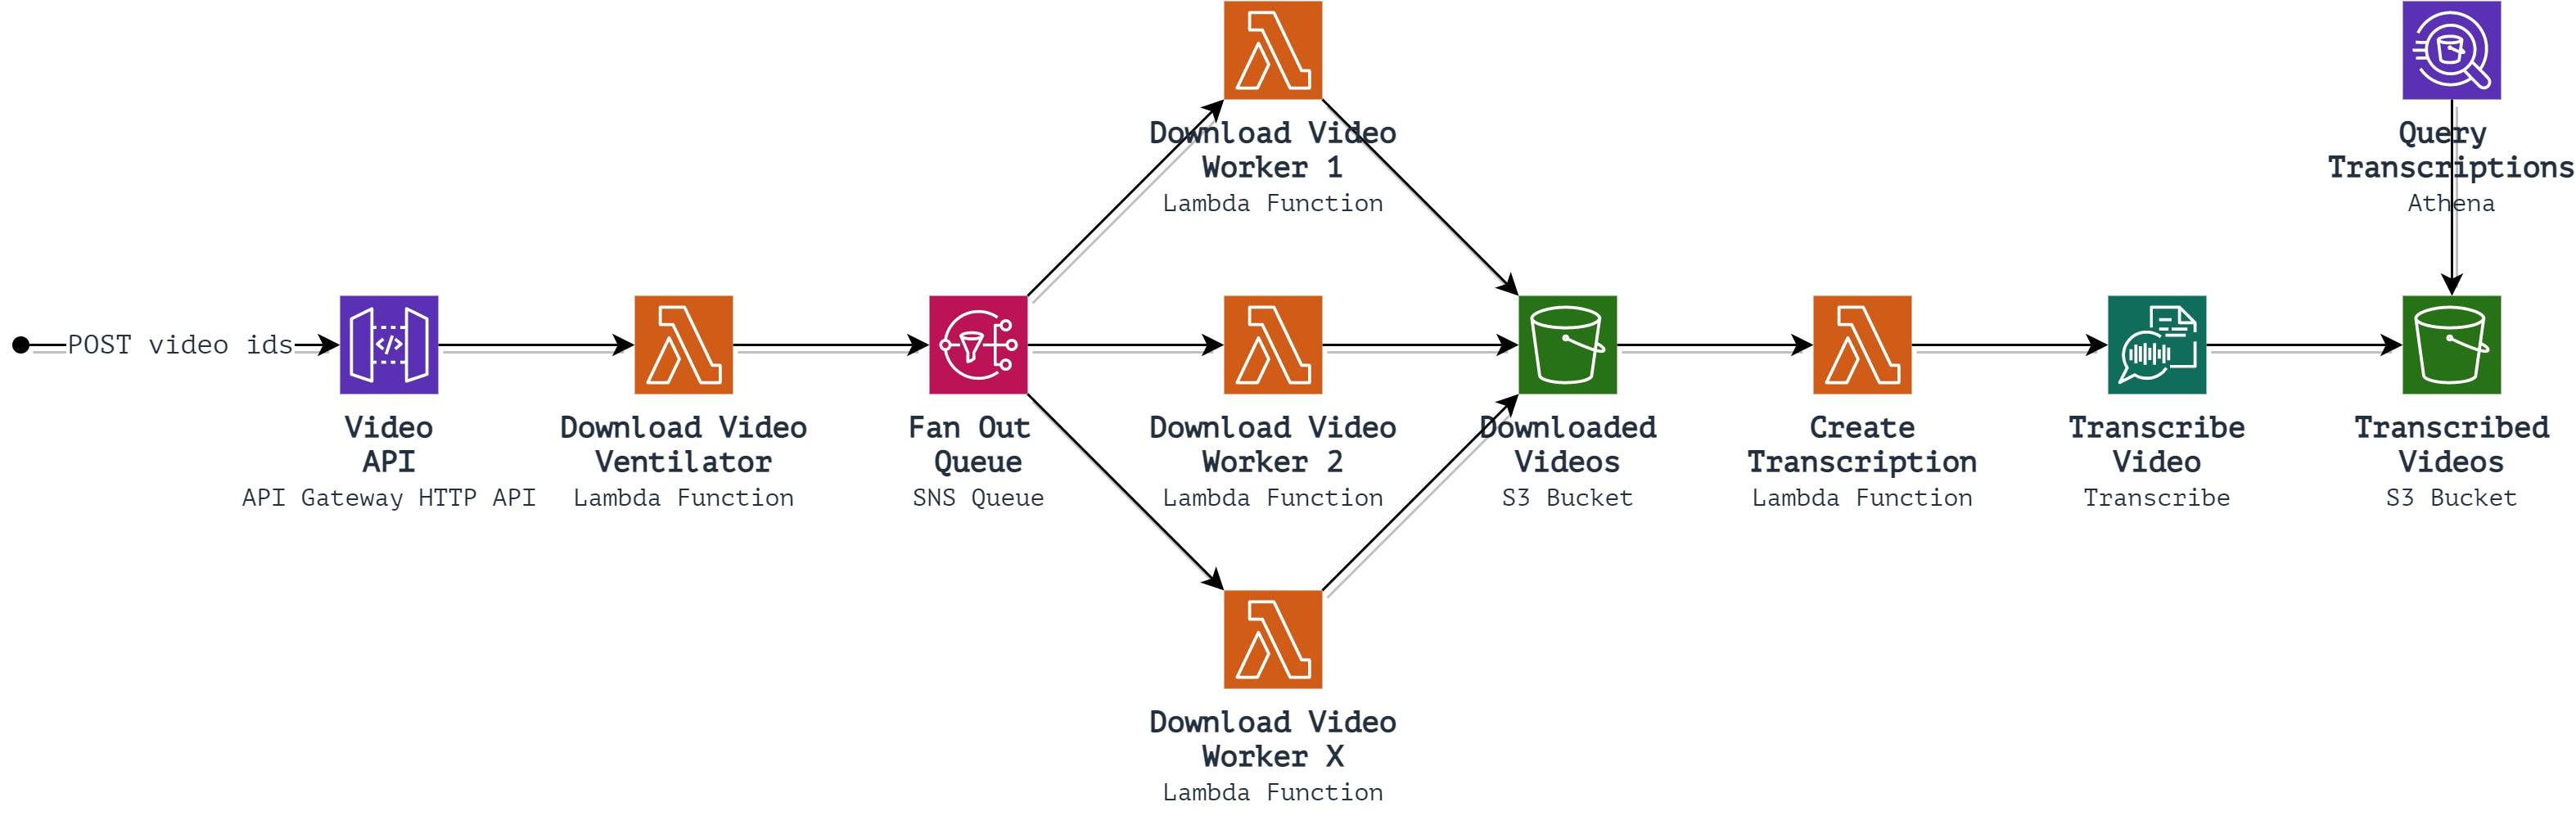 VideoDownloader (8).png